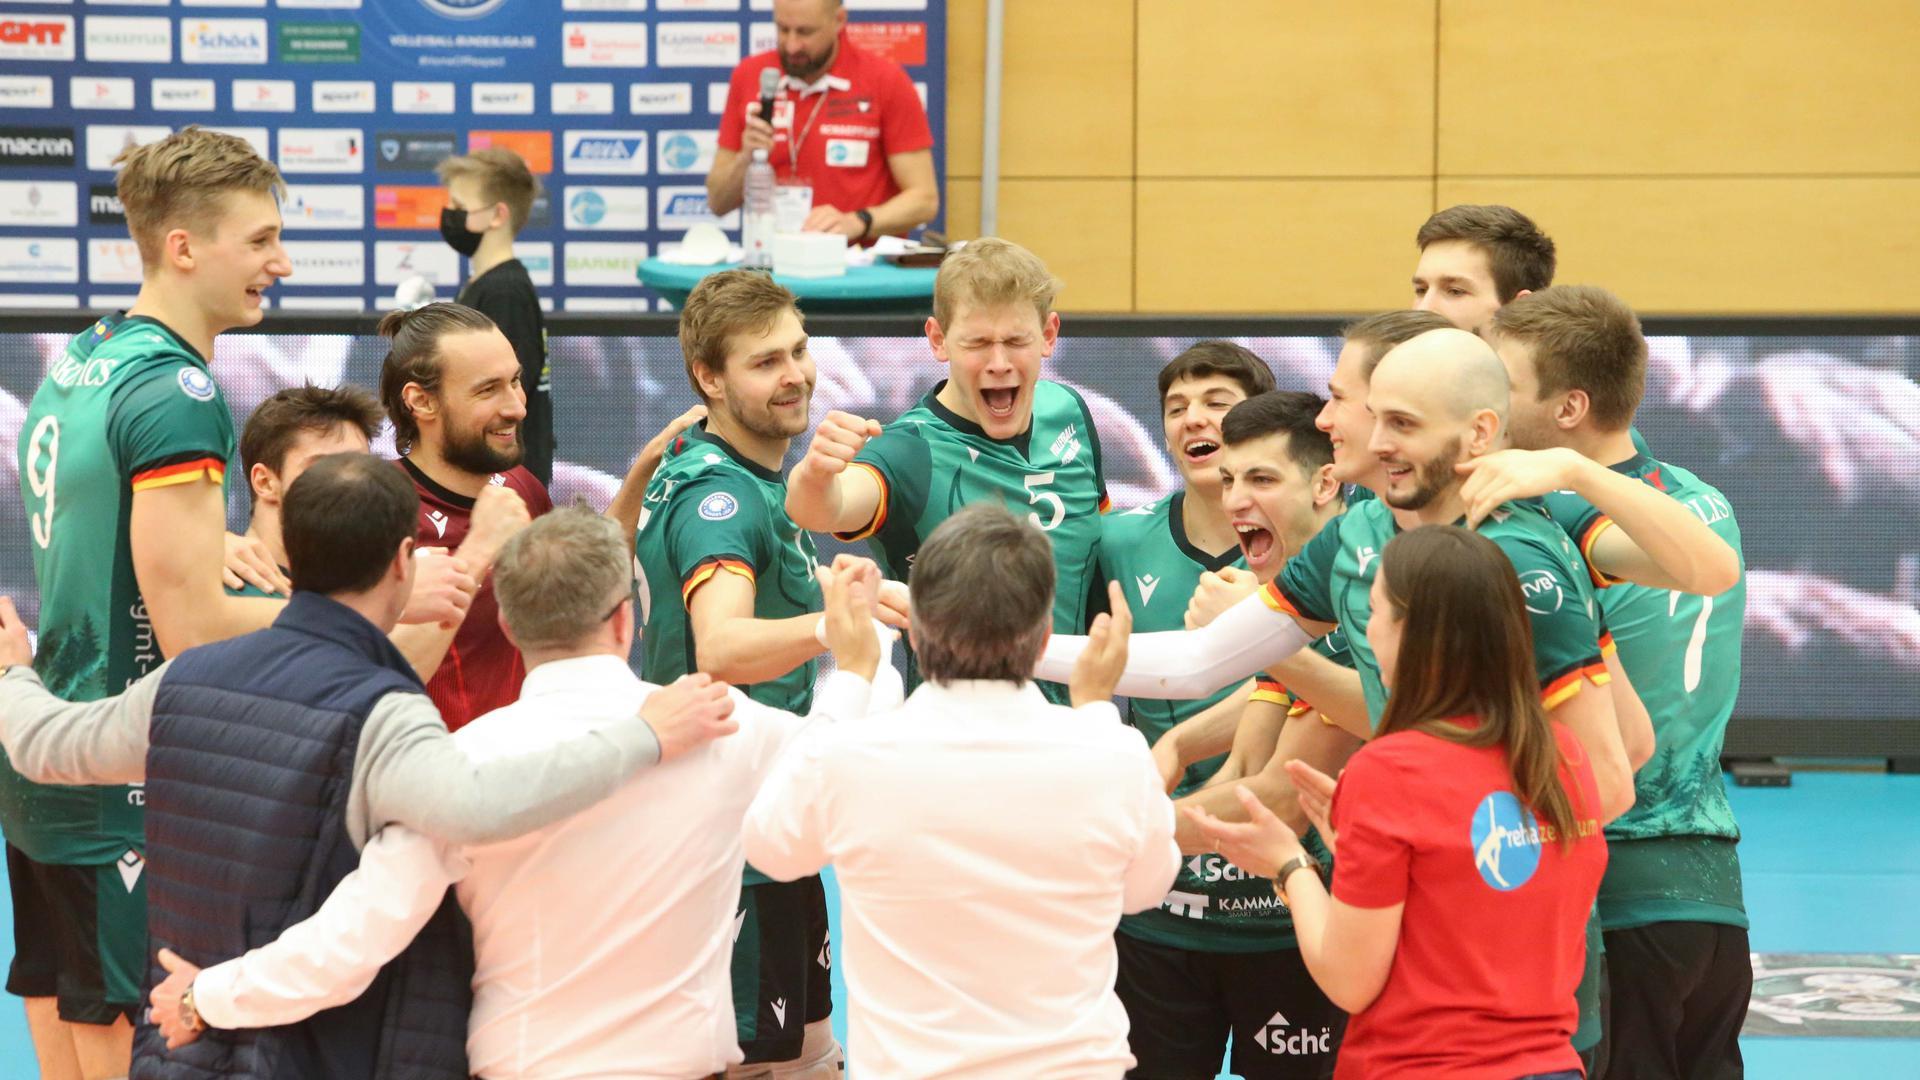 Volleyball-Bundesliga 2020/21, Bisons Bühl - United Volleys Frankfurt (3:1), 6. März 2021